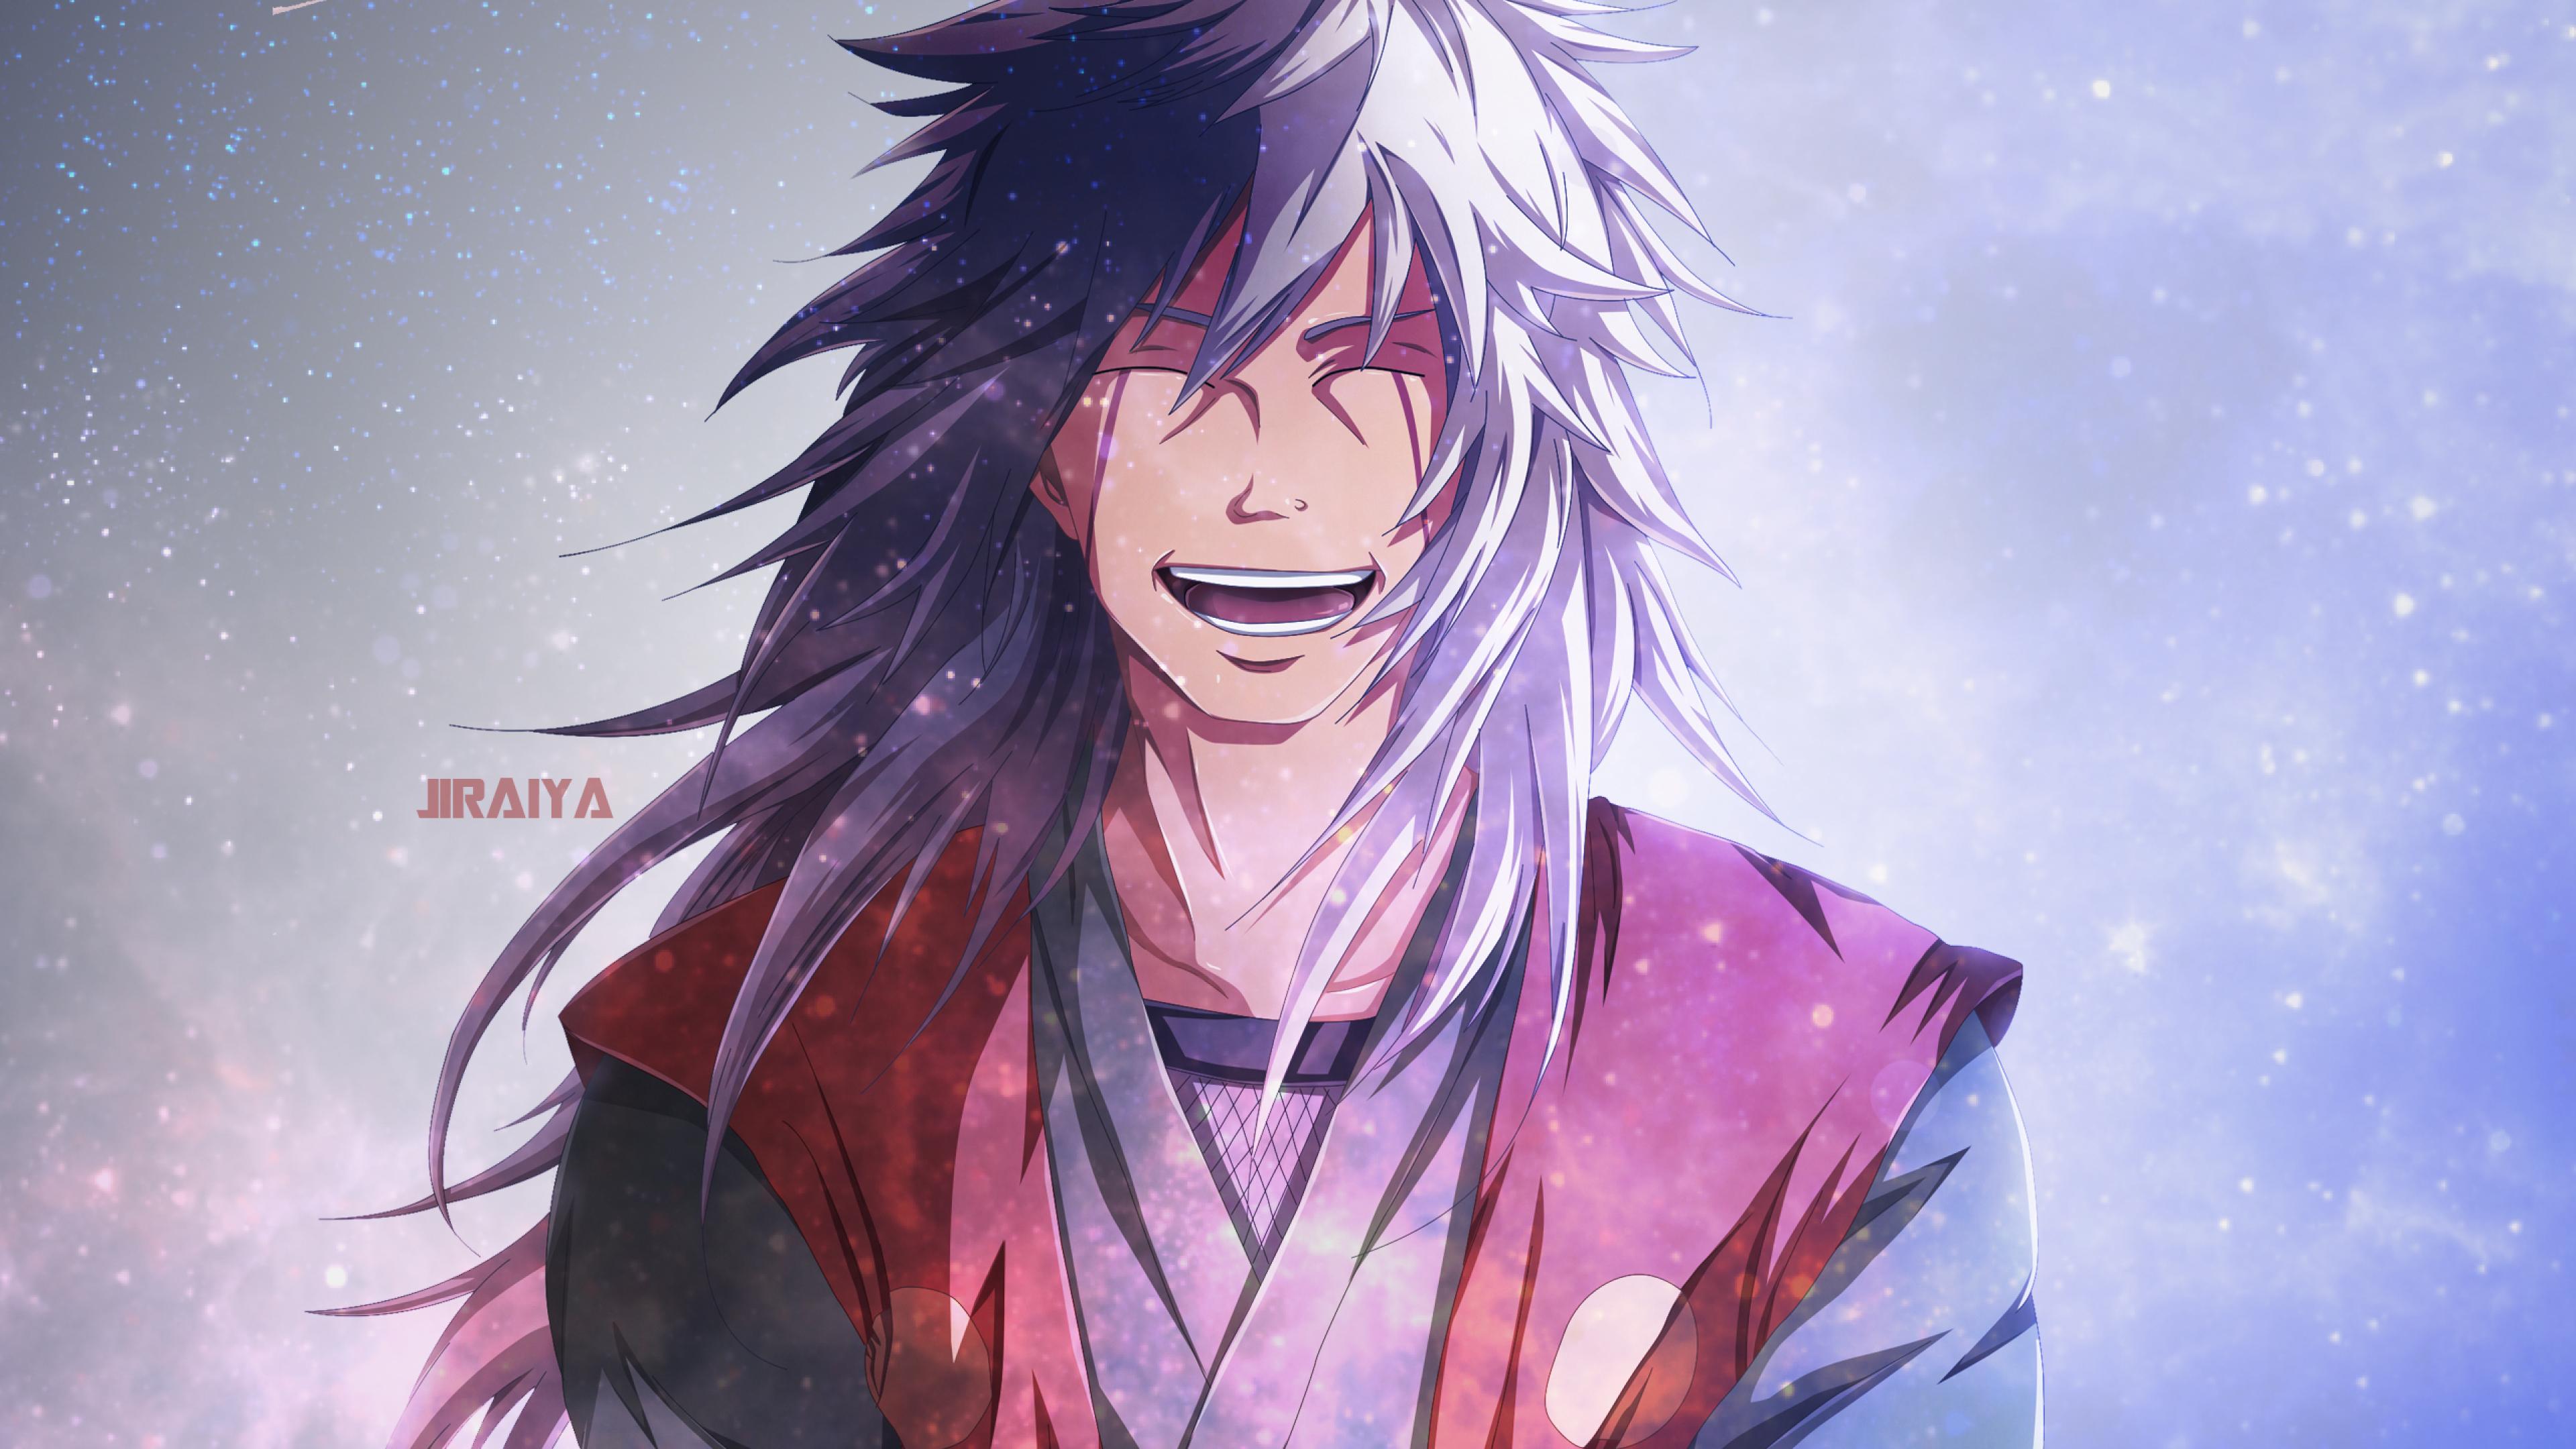 3840x2160 Jiraiya Naruto 4K Wallpaper, HD Anime 4K ...